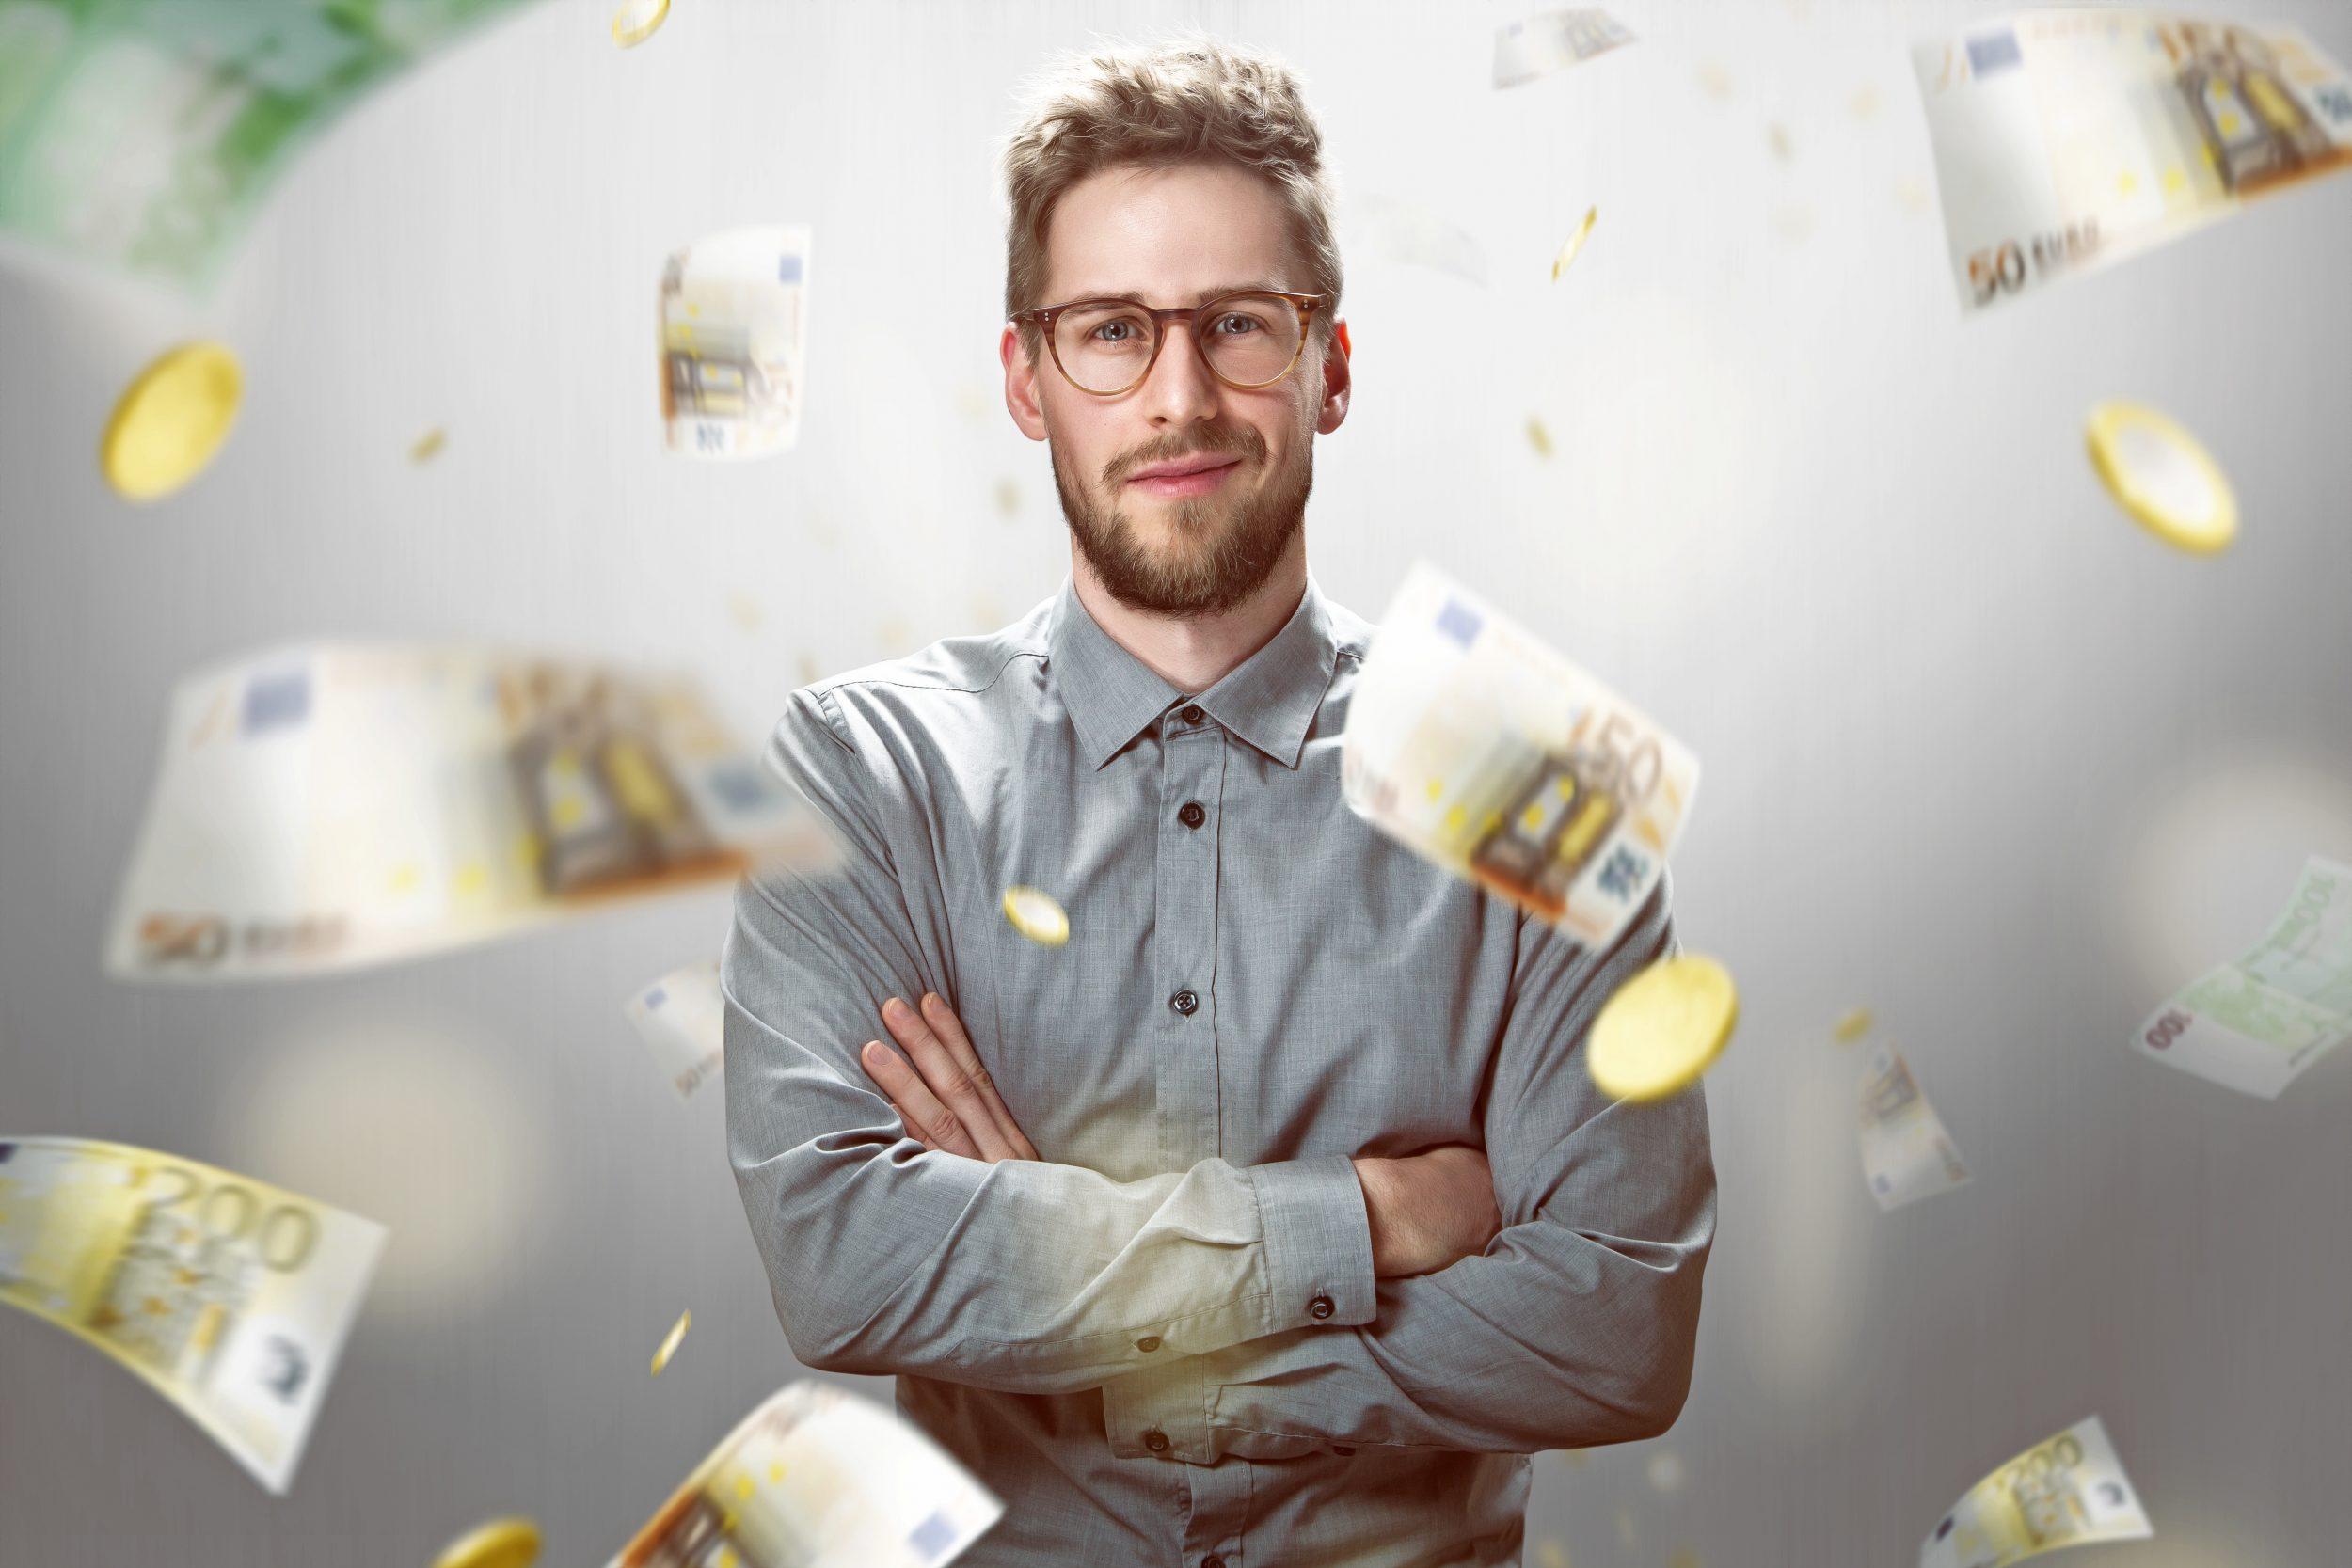 Online Store Dating Website Busines, Make Money